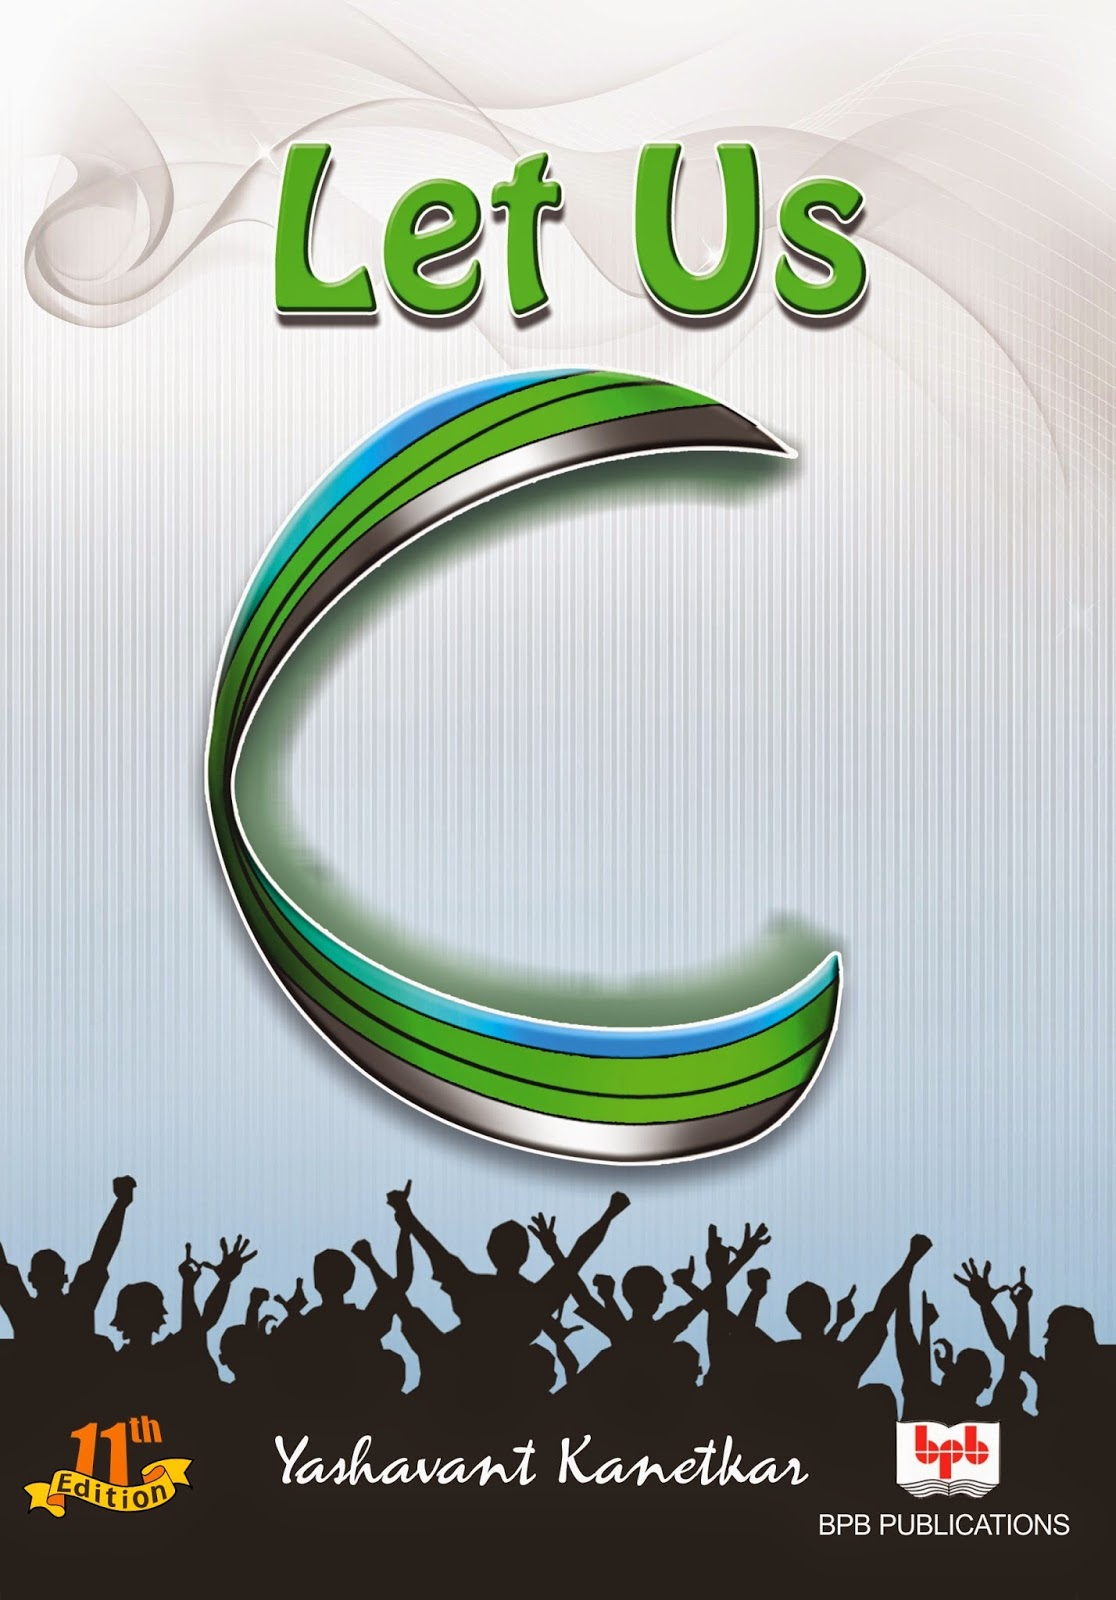 Ncba&e: pdf book let us c yashwant kanetkar 5th edition free.